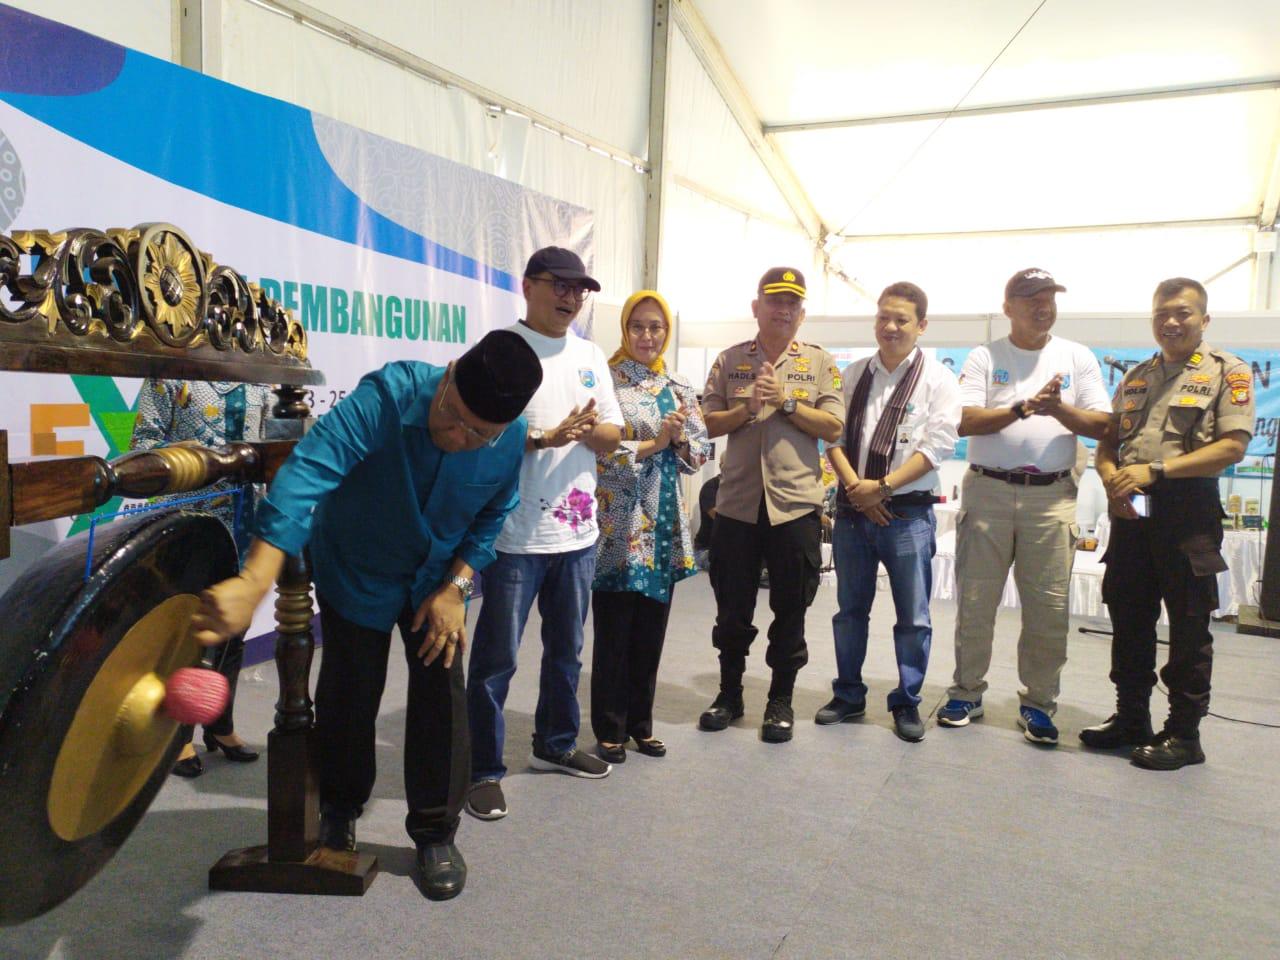 Kegiatan pameran pembangunan Kota Tangerang Selatan di Lapangan Skadron 21 Sena, Jalan Raya Pondok Cabe, Pamulang, Tangsel, Sabtu (23/11/2019).